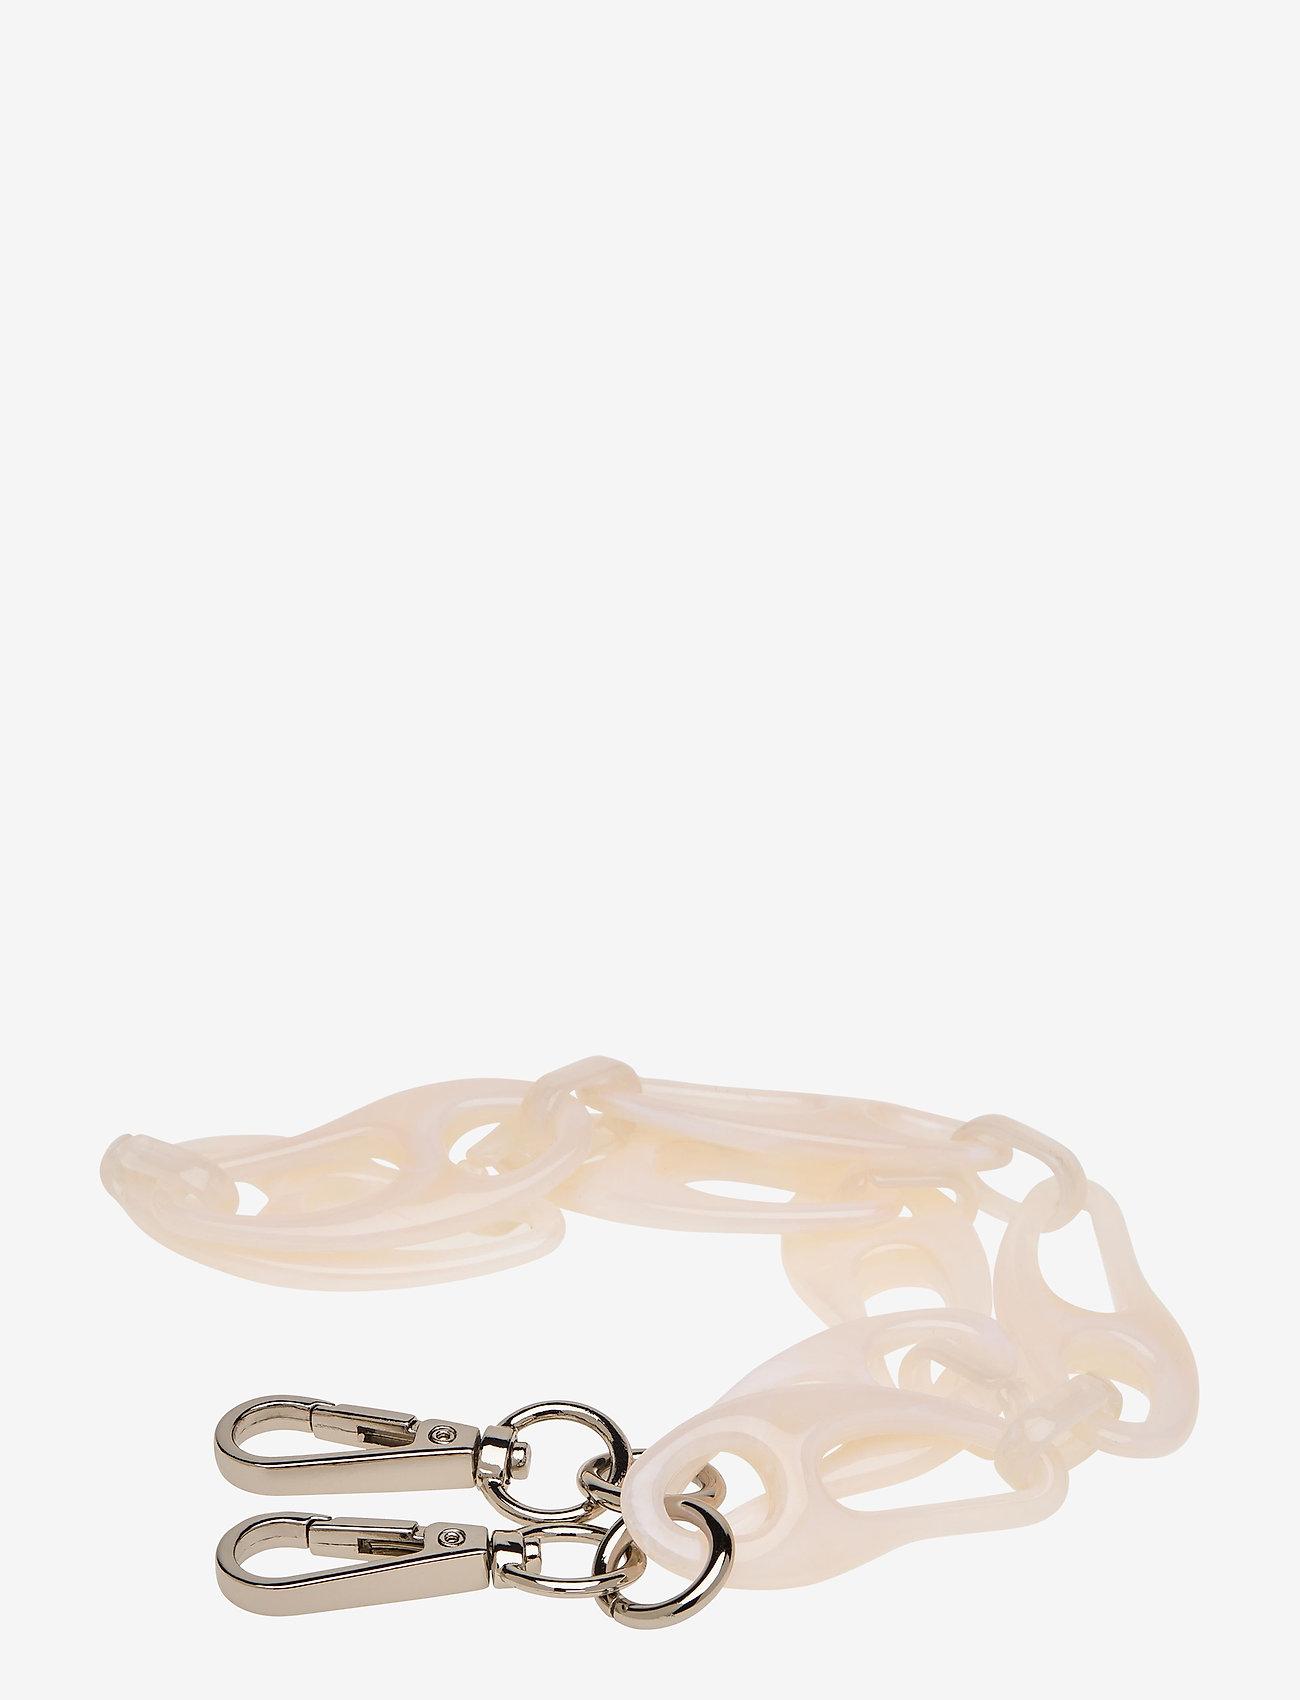 HVISK - WAVY CHAIN HANDLE - sale - white - 0